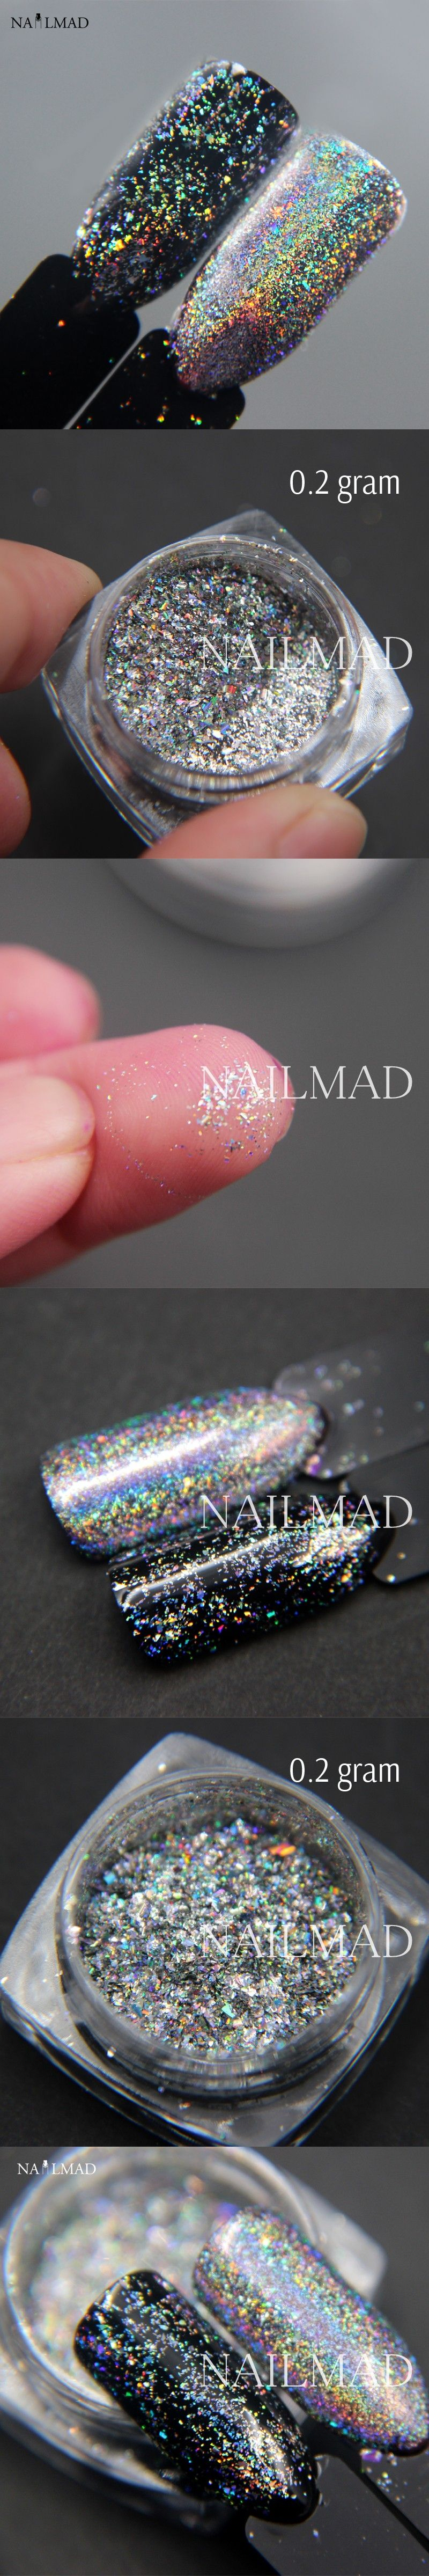 0.2gram/box NailMAD Galaxy Holo Flakes Bling Nail Flecks Powder ...